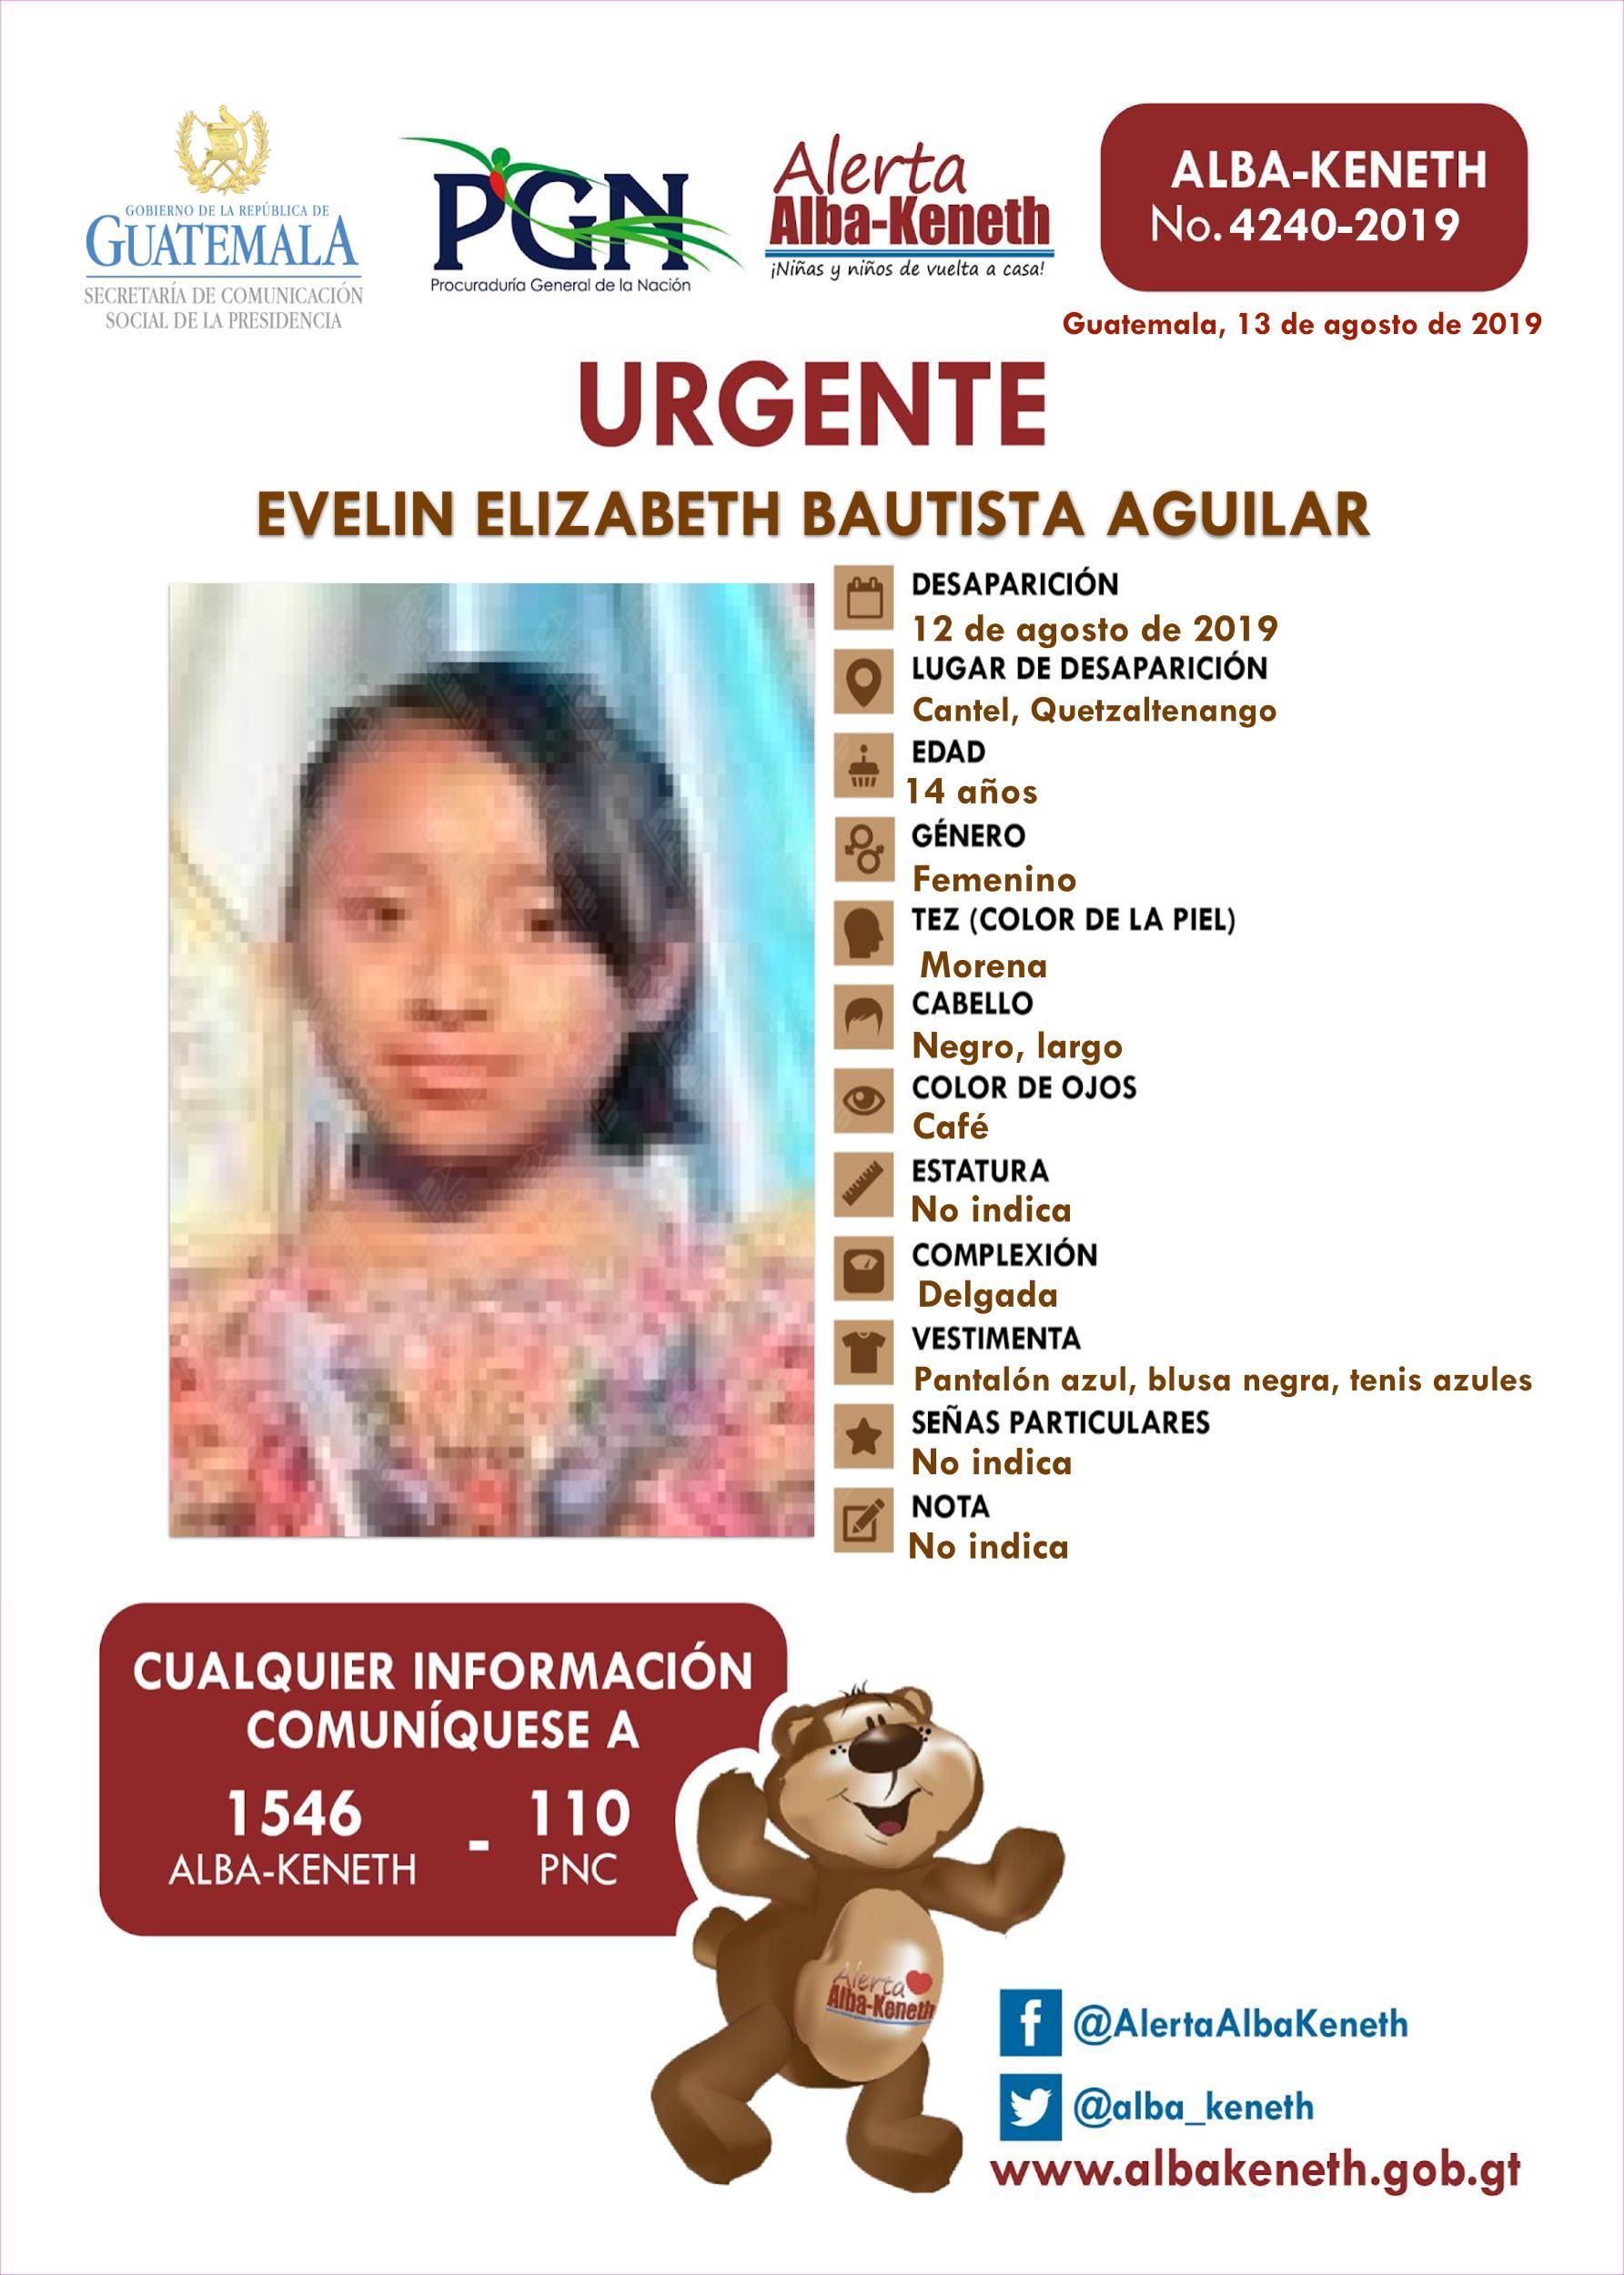 Evelin Elizabeth Bautista Aguilar